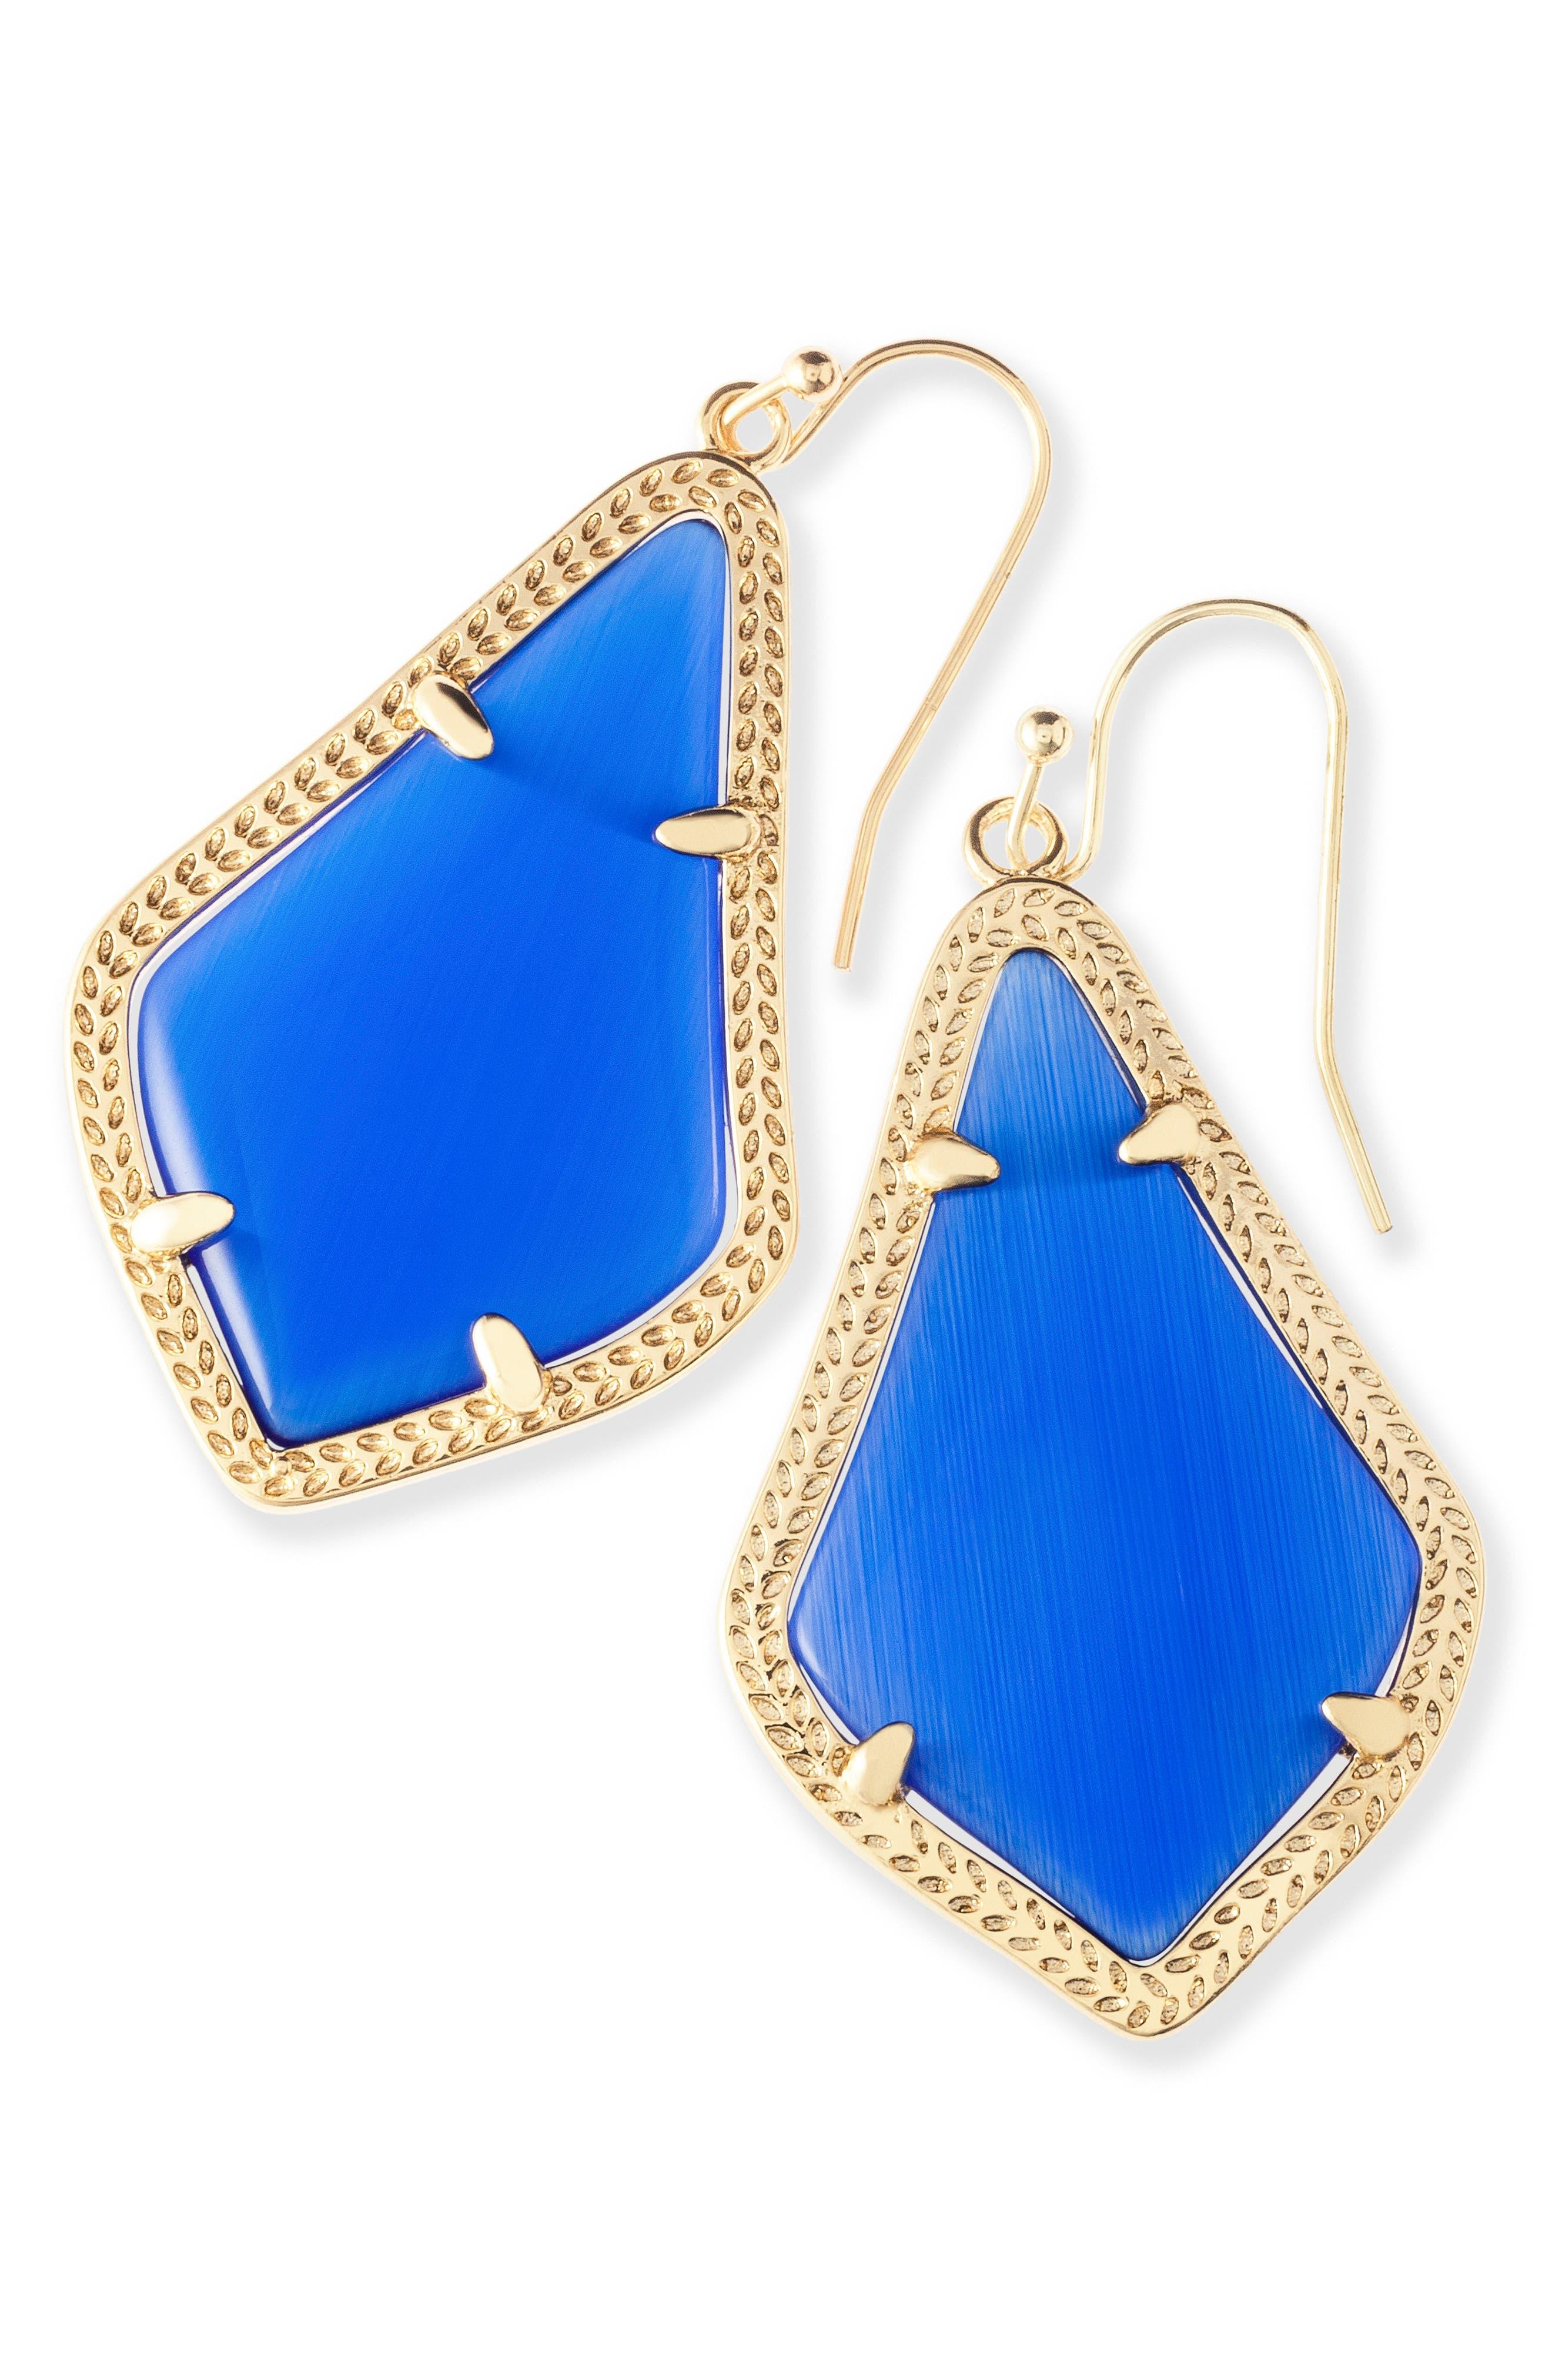 Alex Drop Earrings,                             Alternate thumbnail 2, color,                             Cobalt Catseye/ Gold